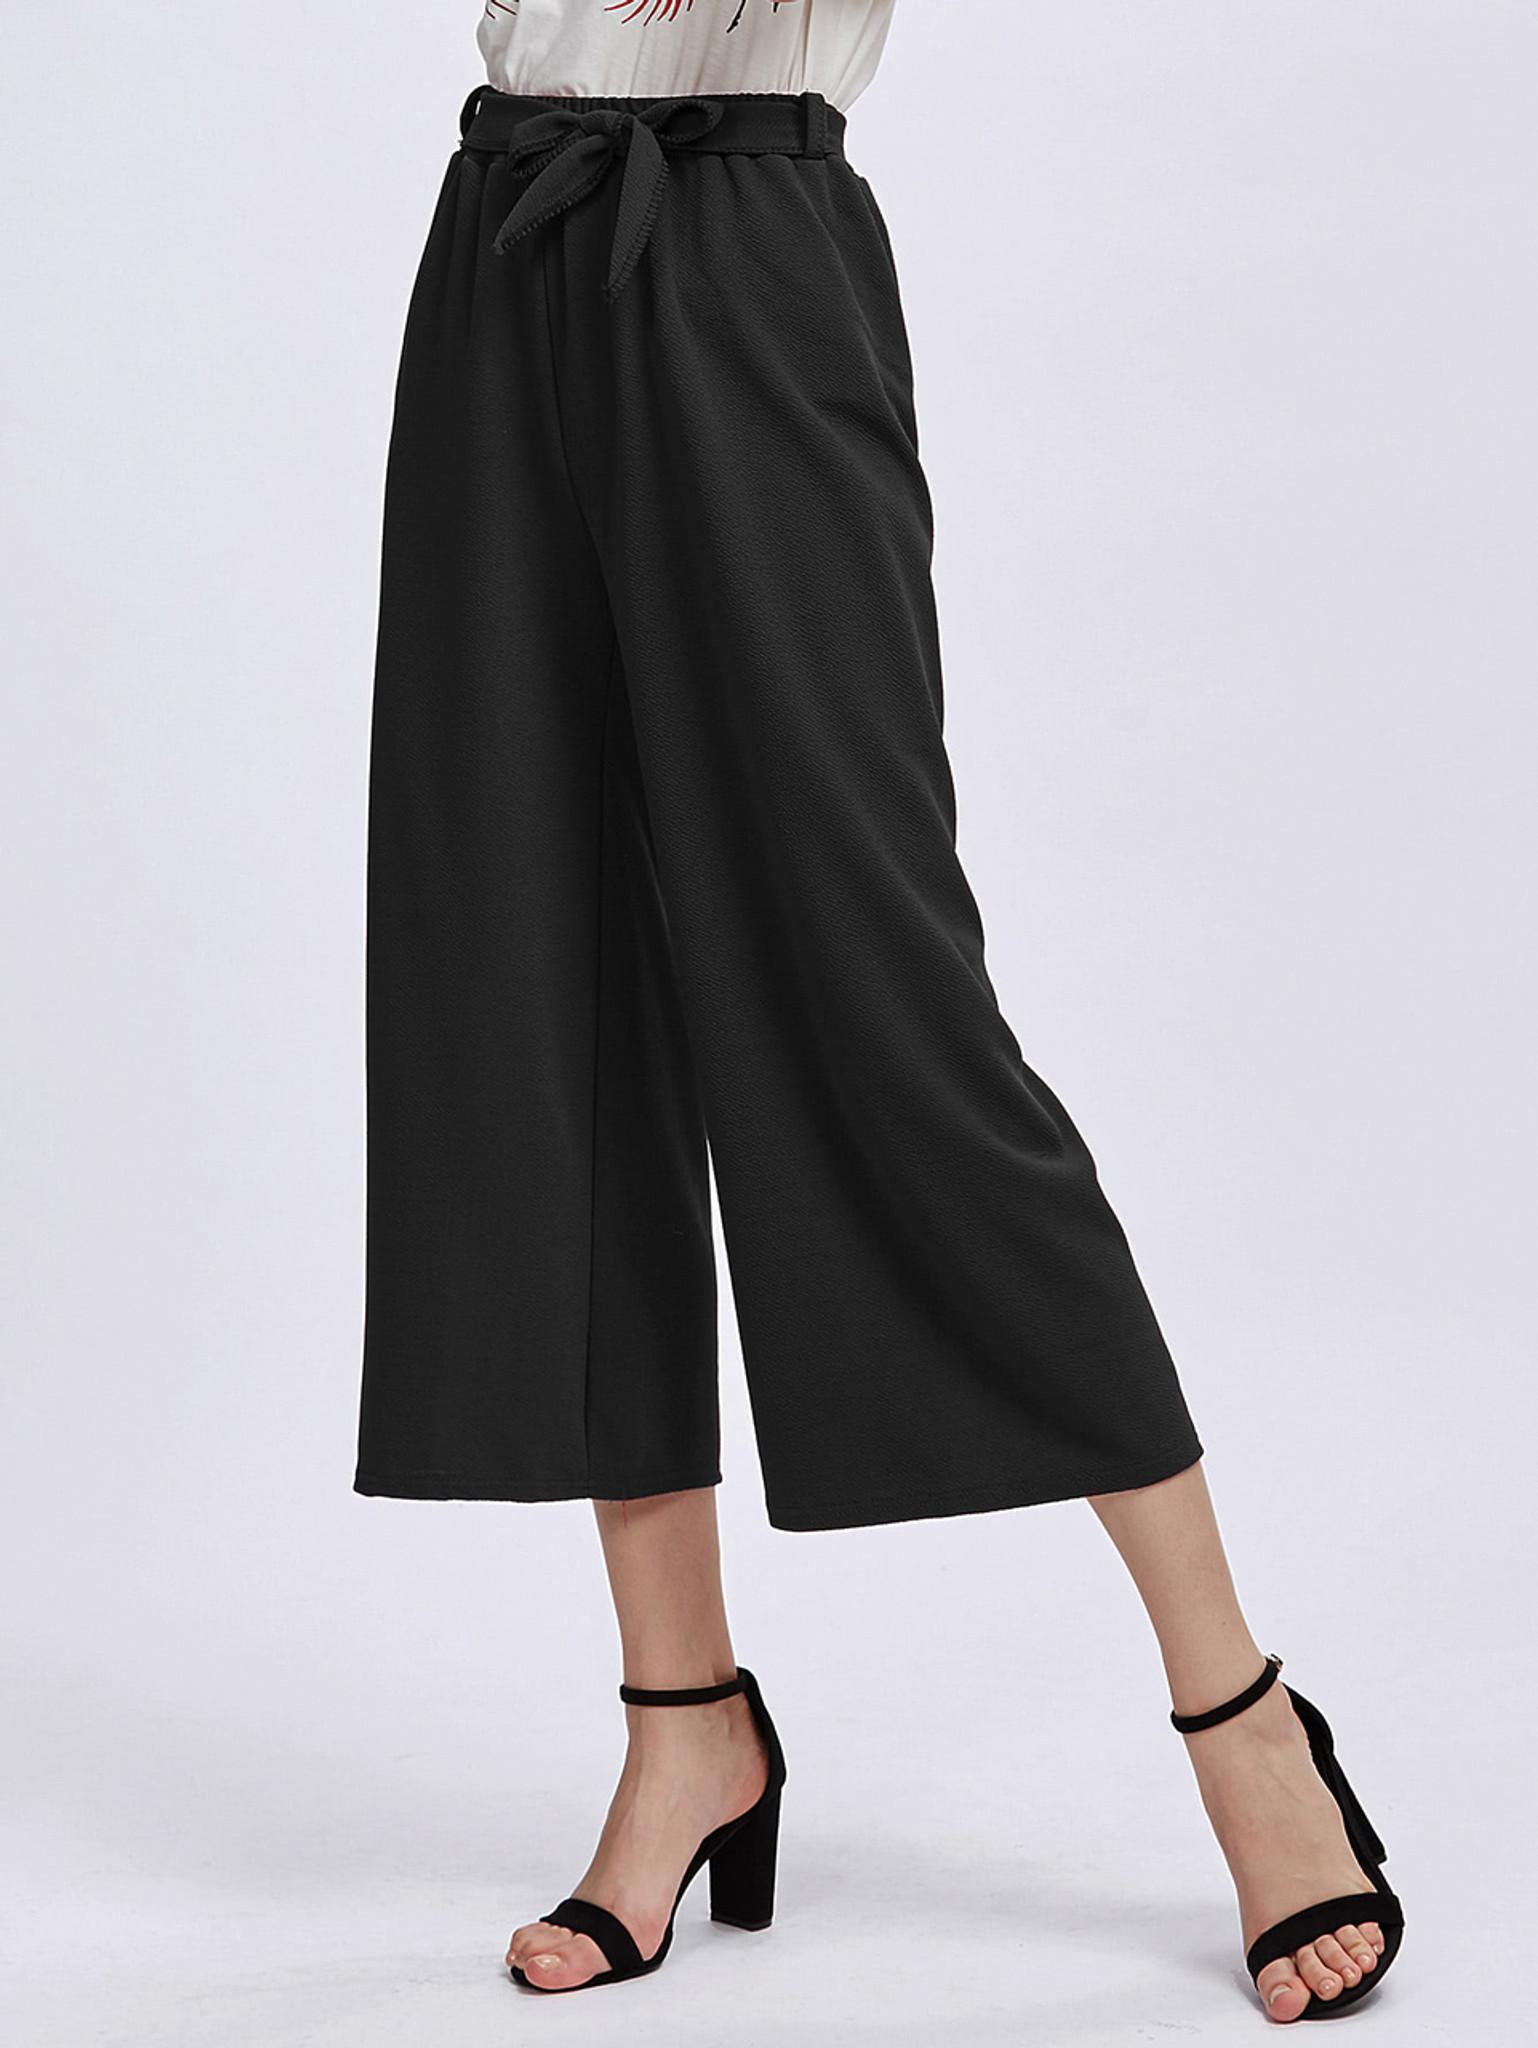 Fifth Avenue Georgette Tie-Waist Culotte Pants - Black